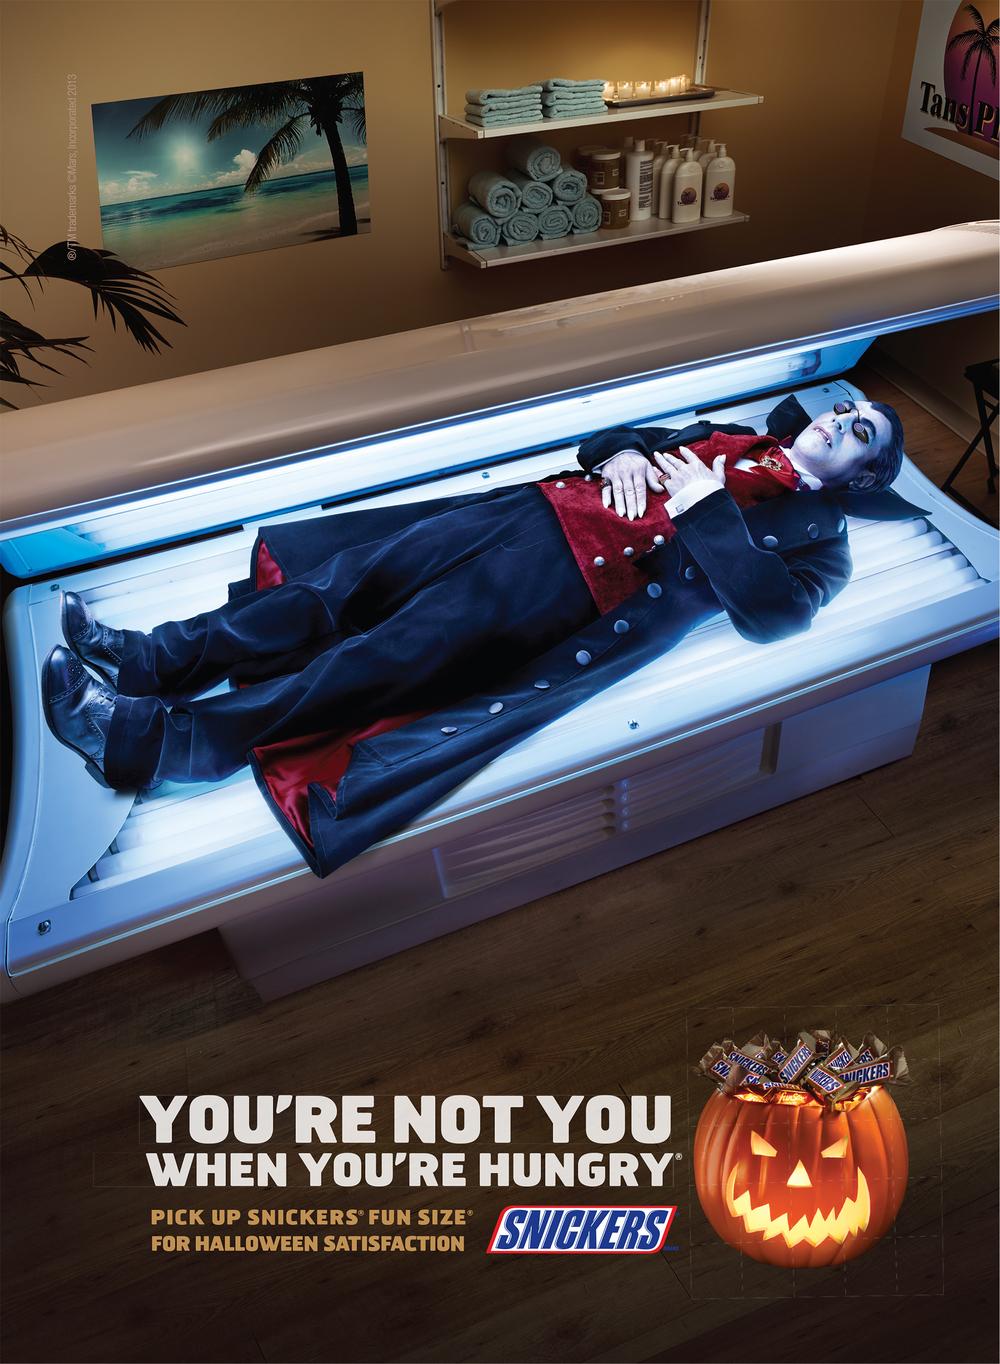 Snickers Halloween ad.jpg